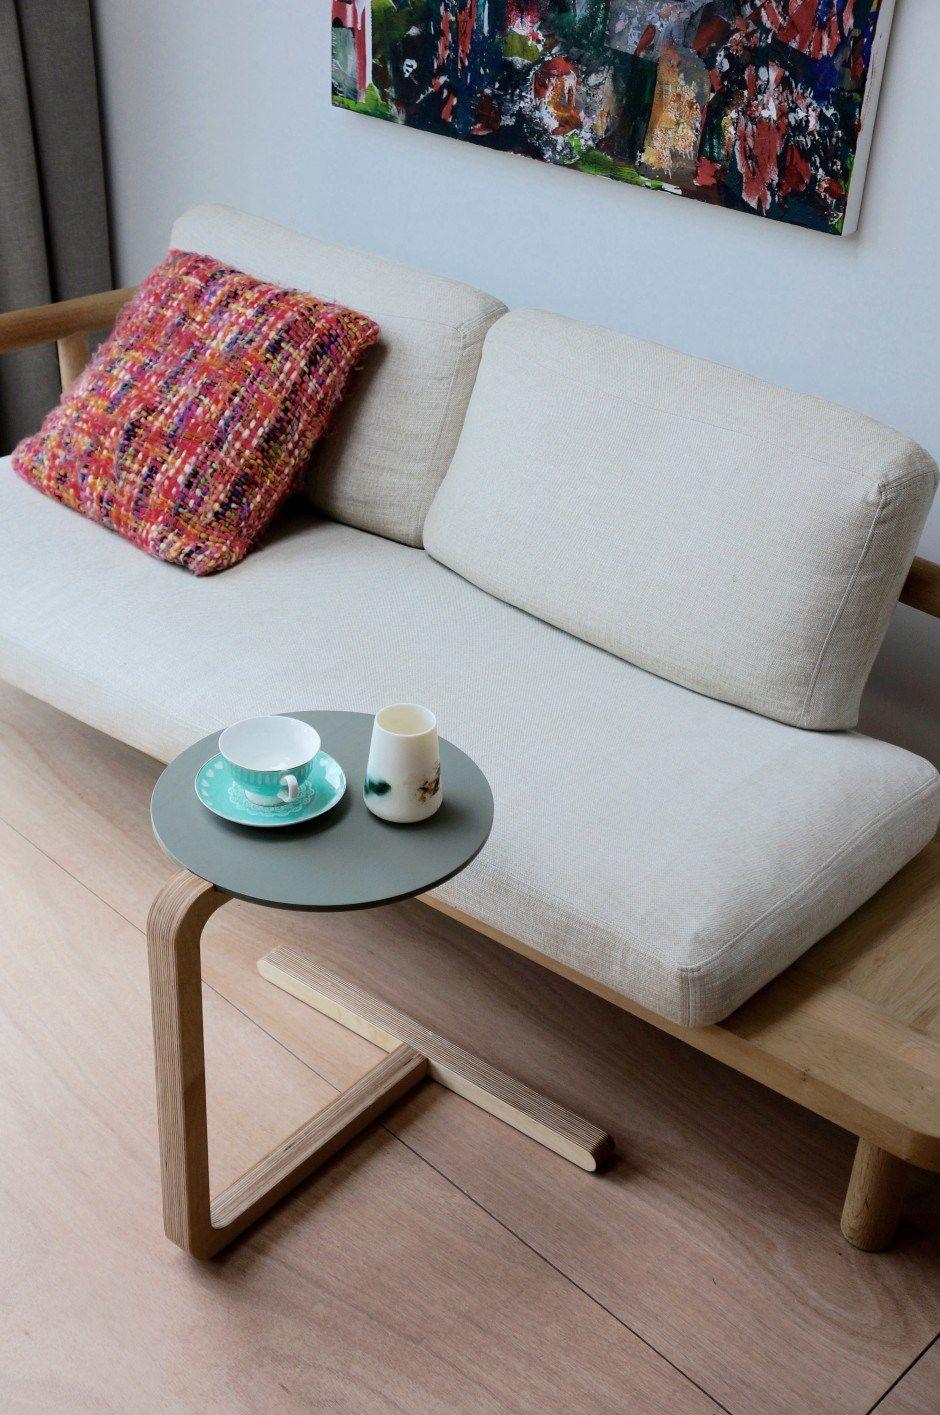 Inspiratie - MZ meubel   Furniture   Pinterest   Wohnideen, Runde ...